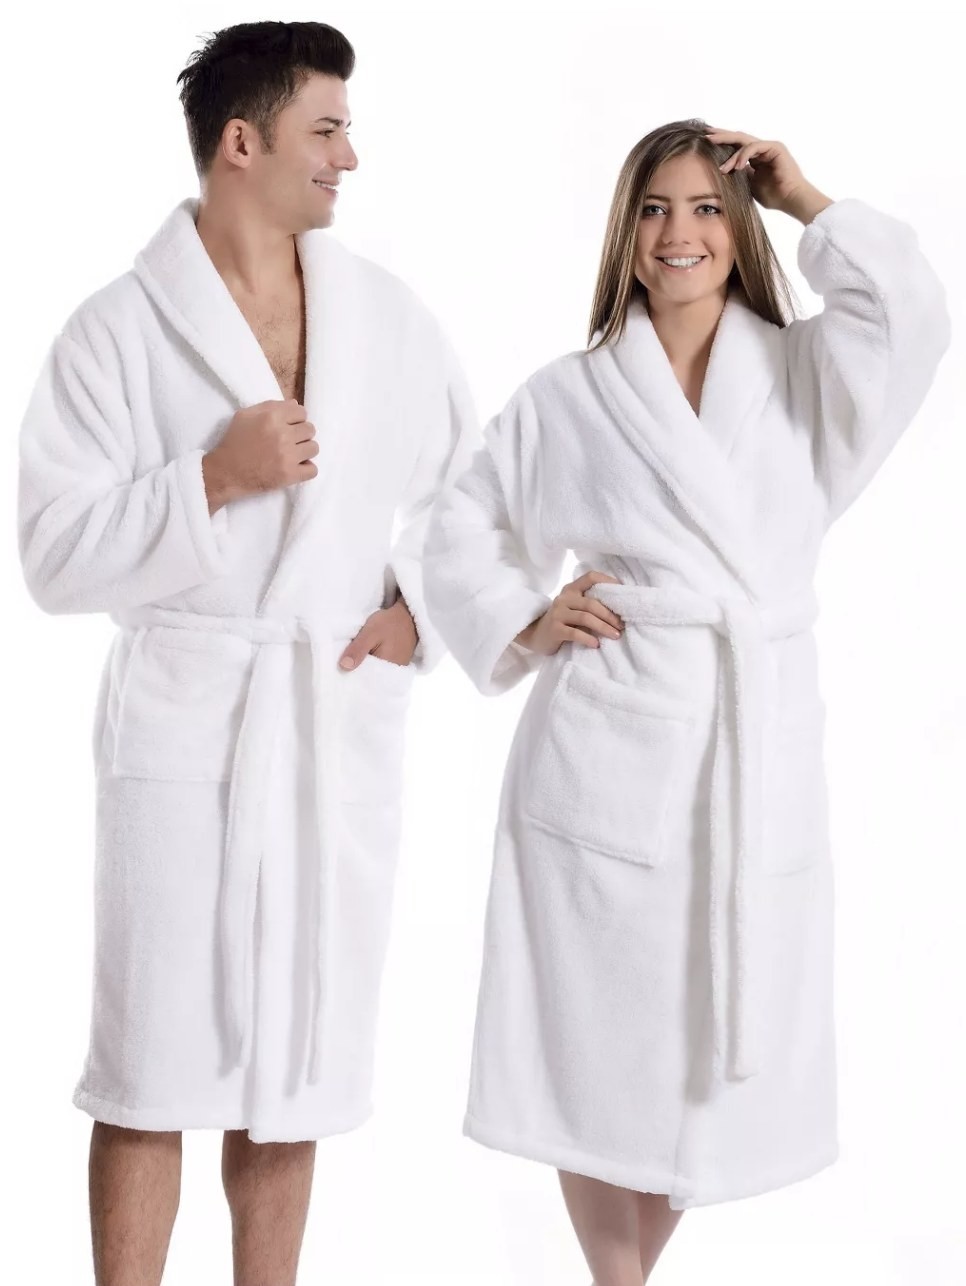 two models wearing white unisex bathrobes